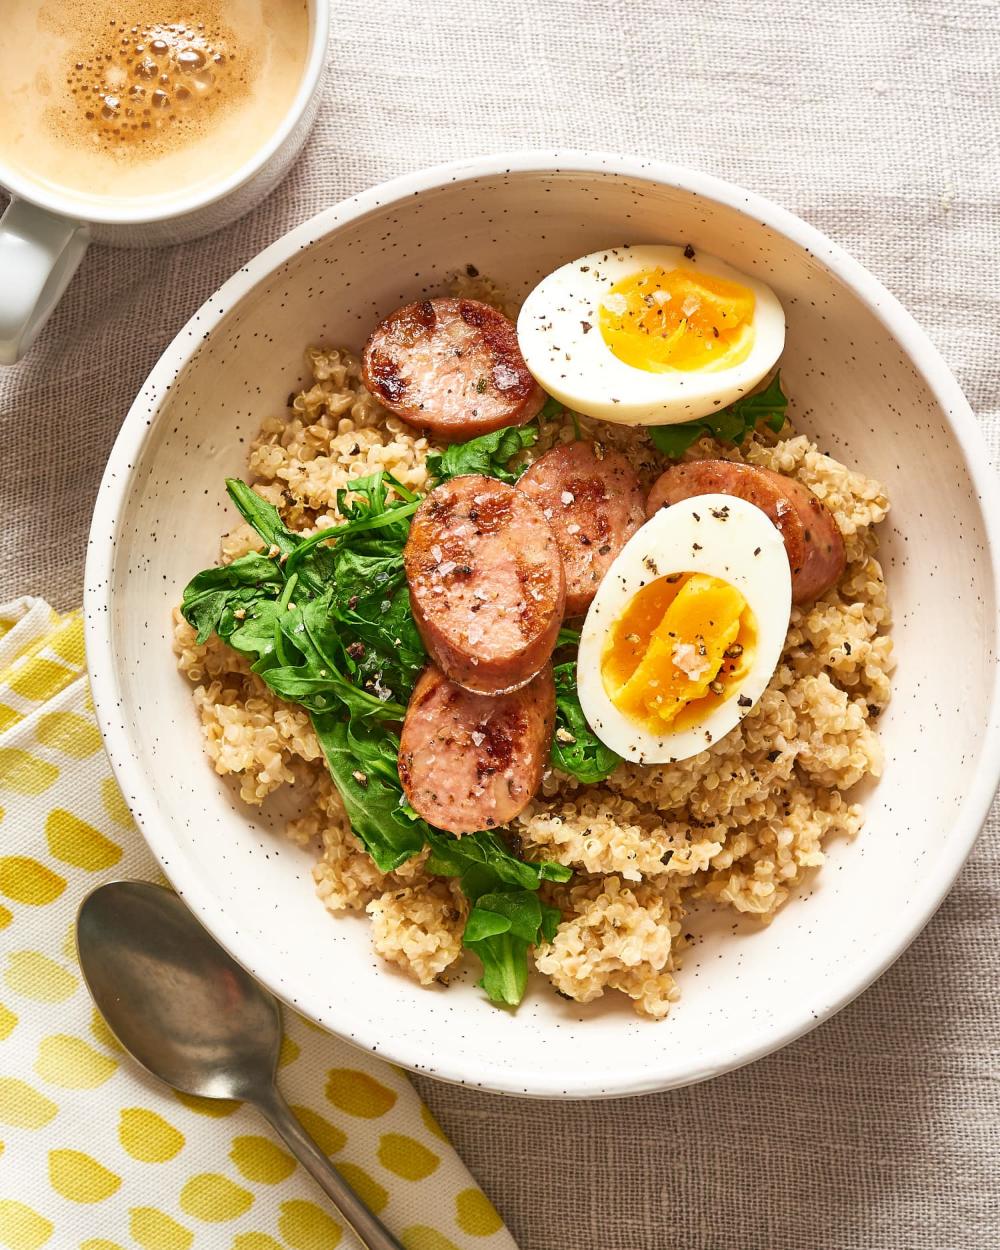 10 HighFiber Breakfasts That Aren't Cereal in 2020 High